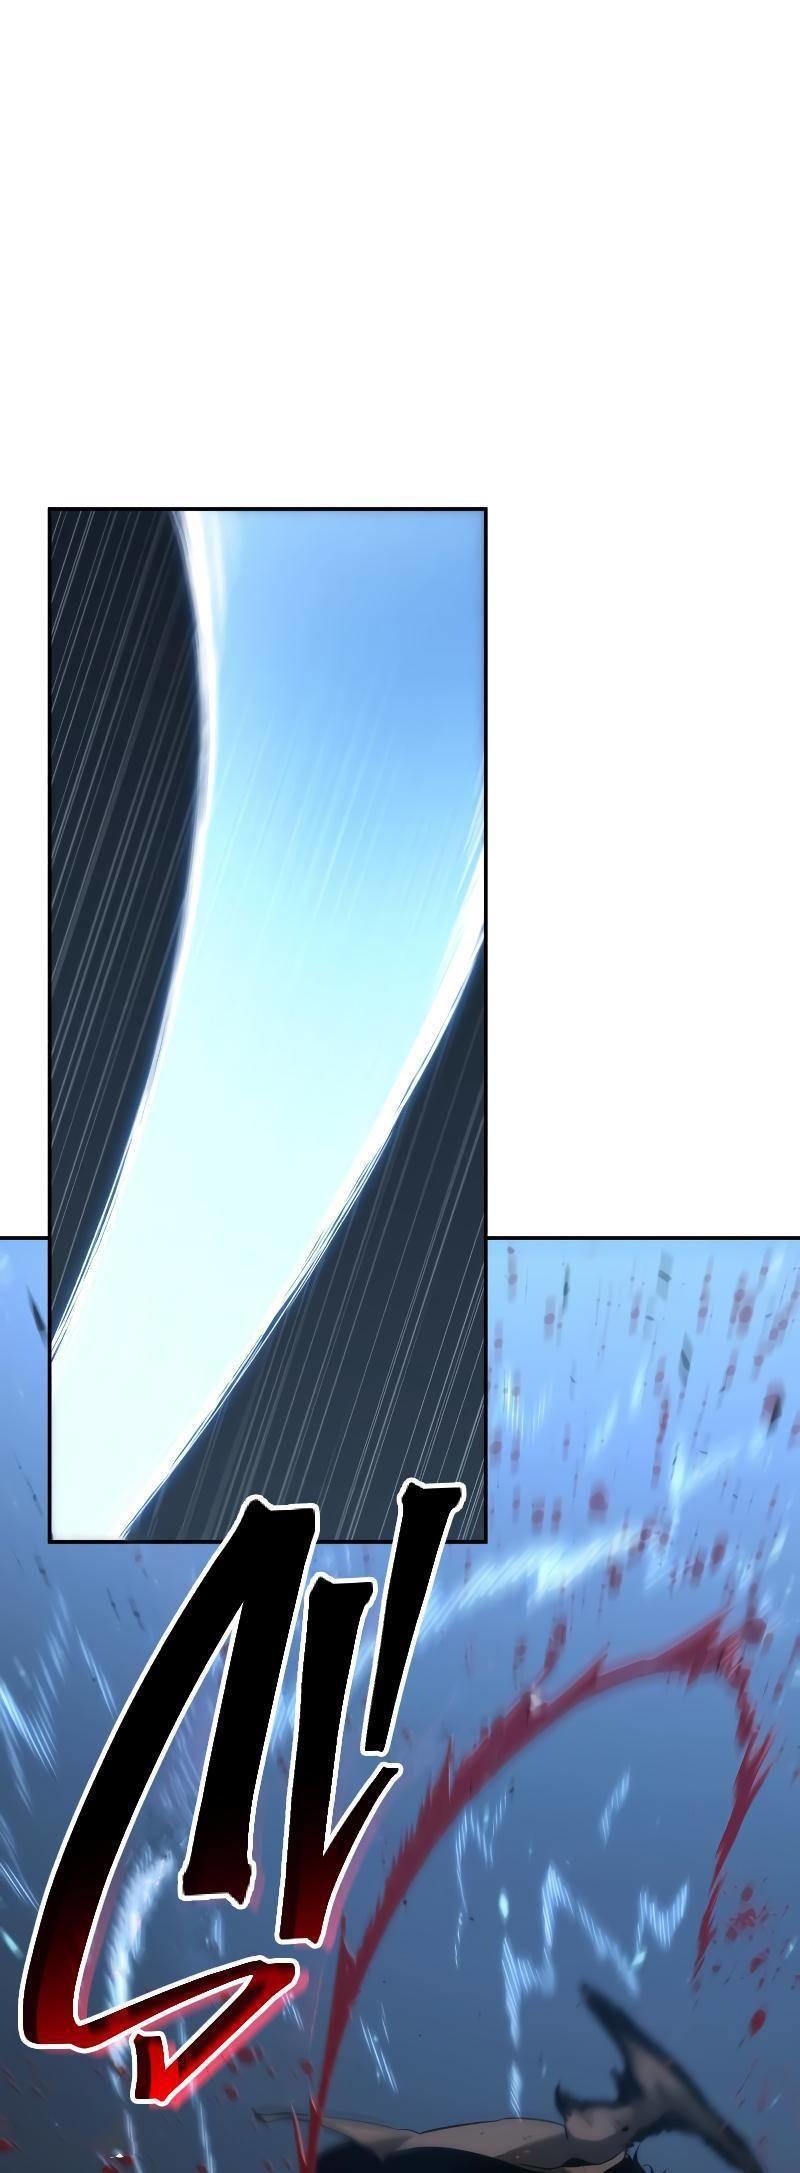 Omniscient Reader'S Viewpoint Chapter 72 page 1 - Mangakakalot